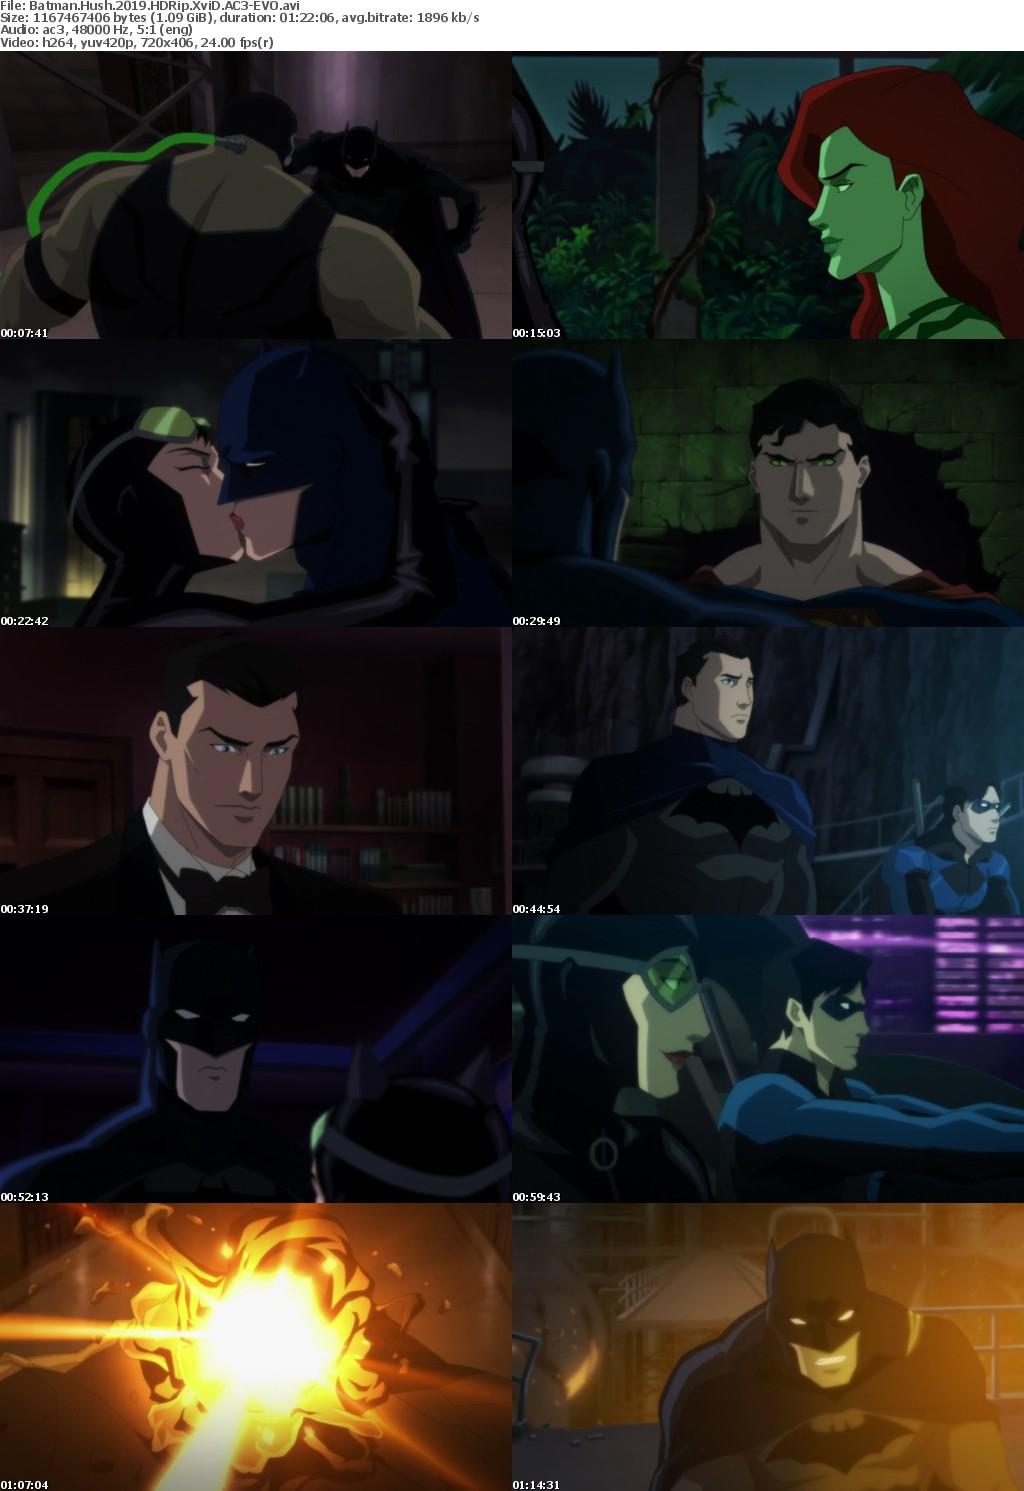 Batman Hush (2019) HDRip XviD AC3 EVO